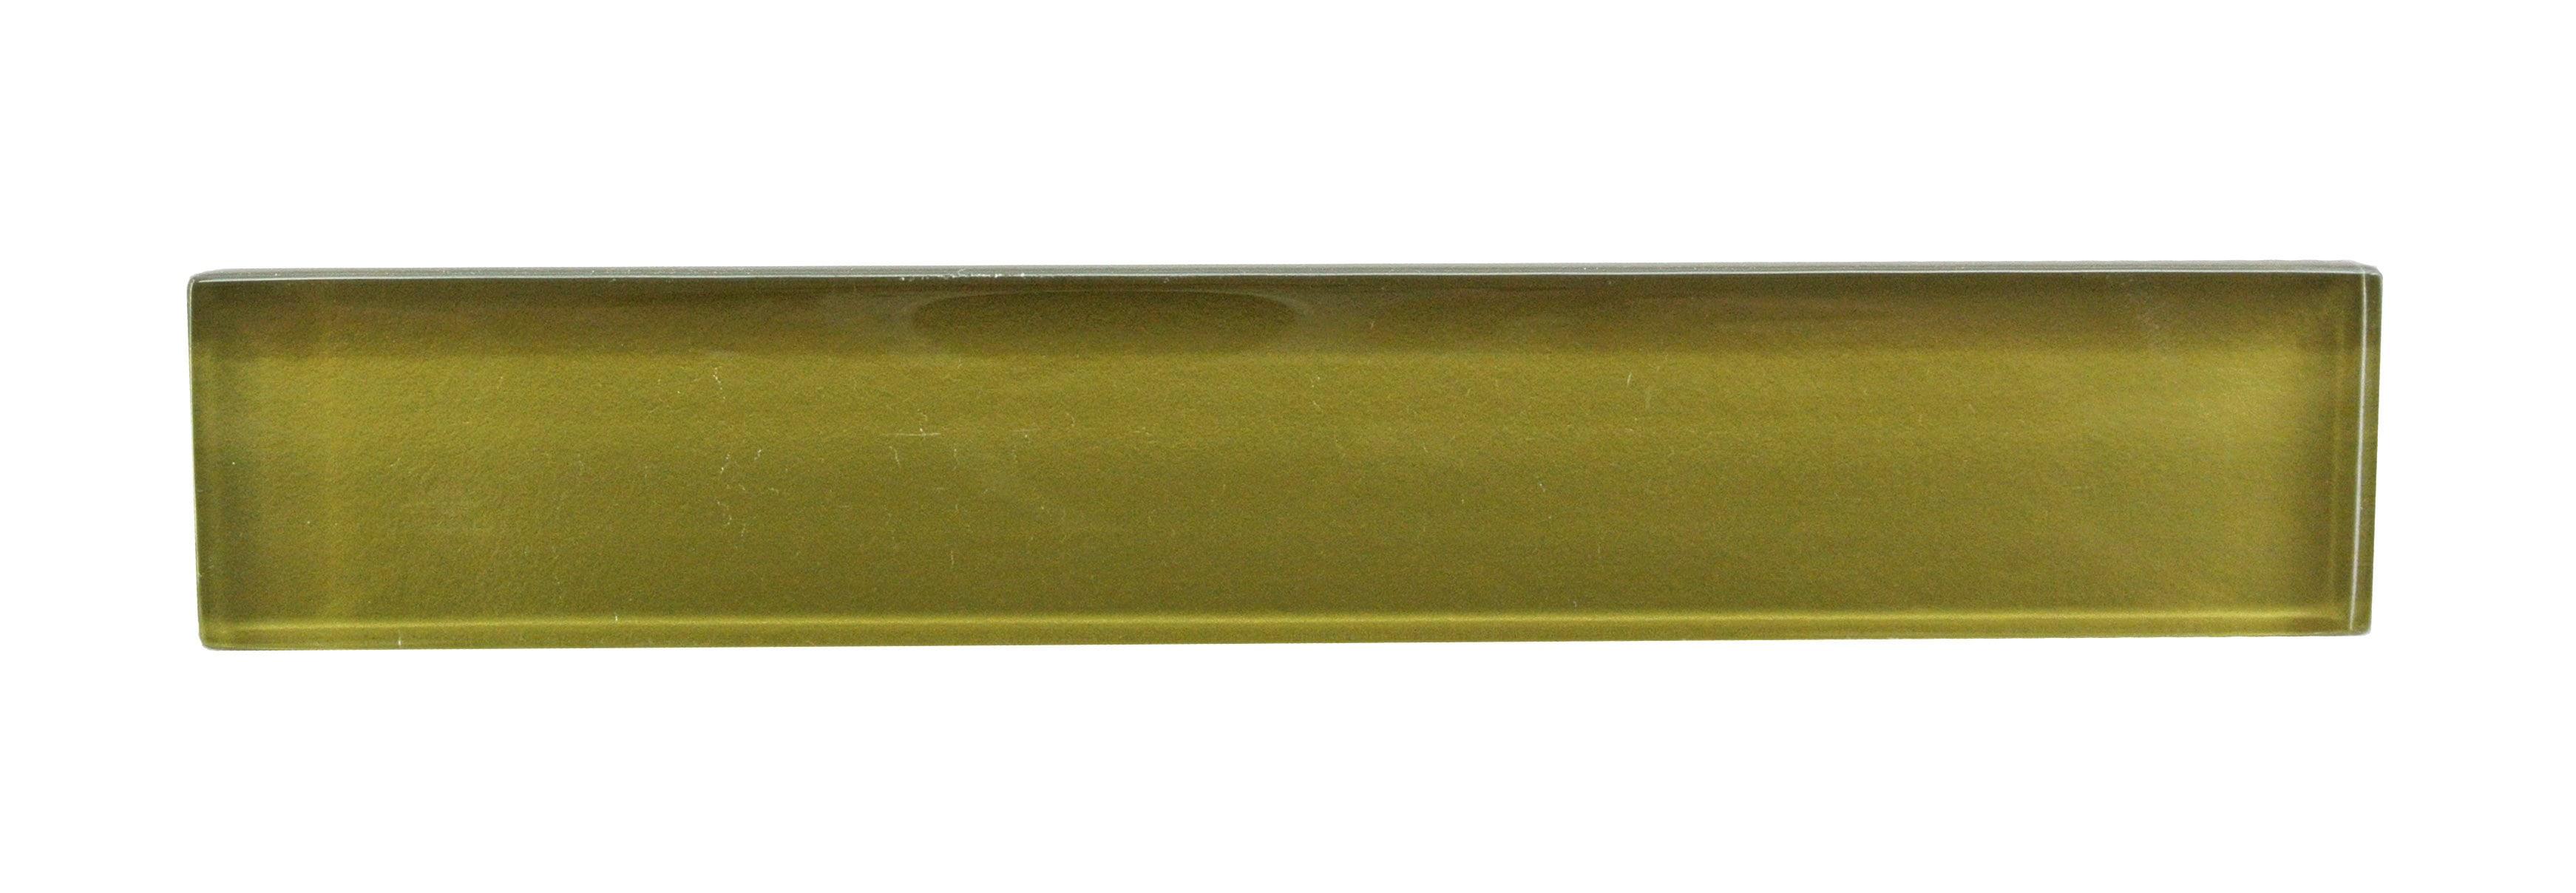 "HI 08 (27x152) - Olive / 1""x6"" Autunno HI 0"